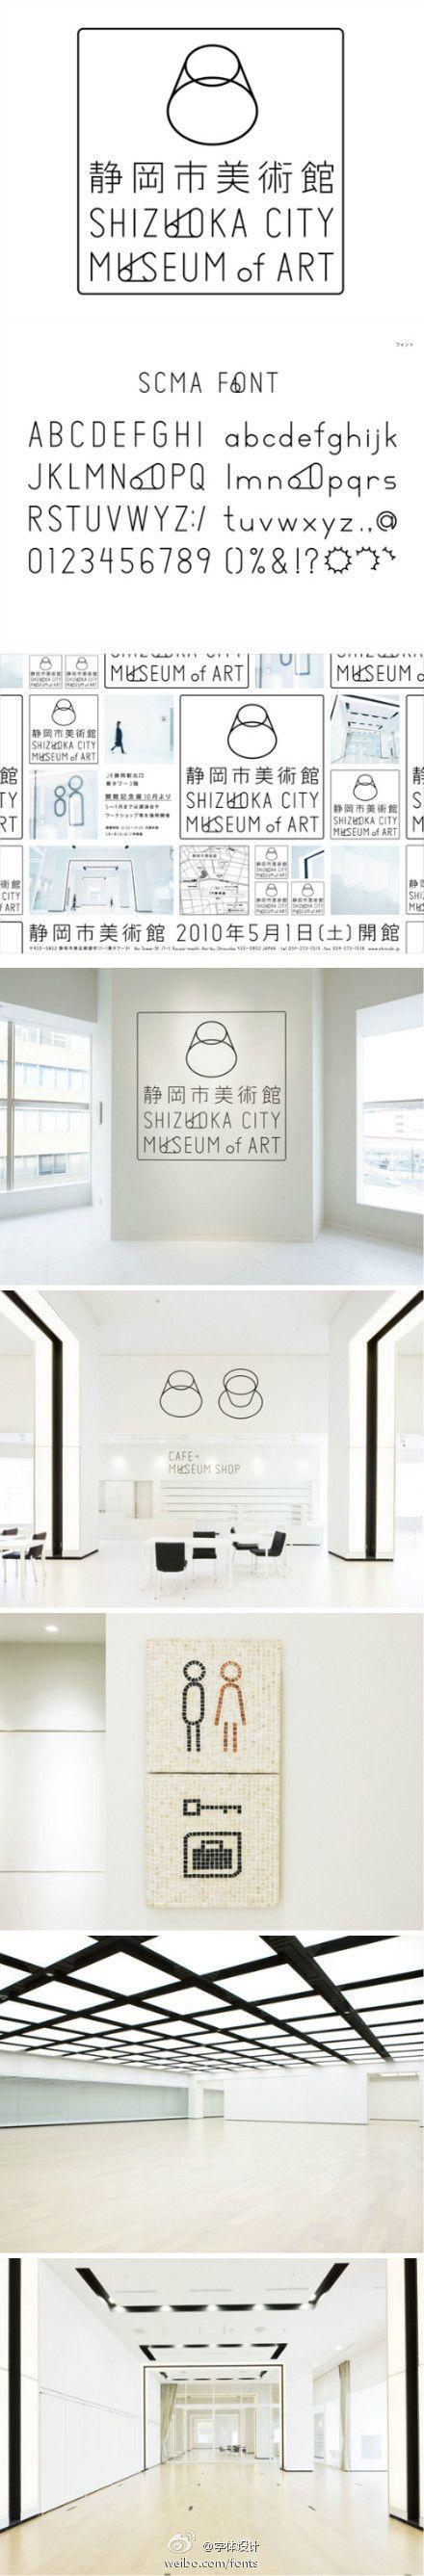 SHIZUOKA CITY MUSEUM of ART/静岡市美術館